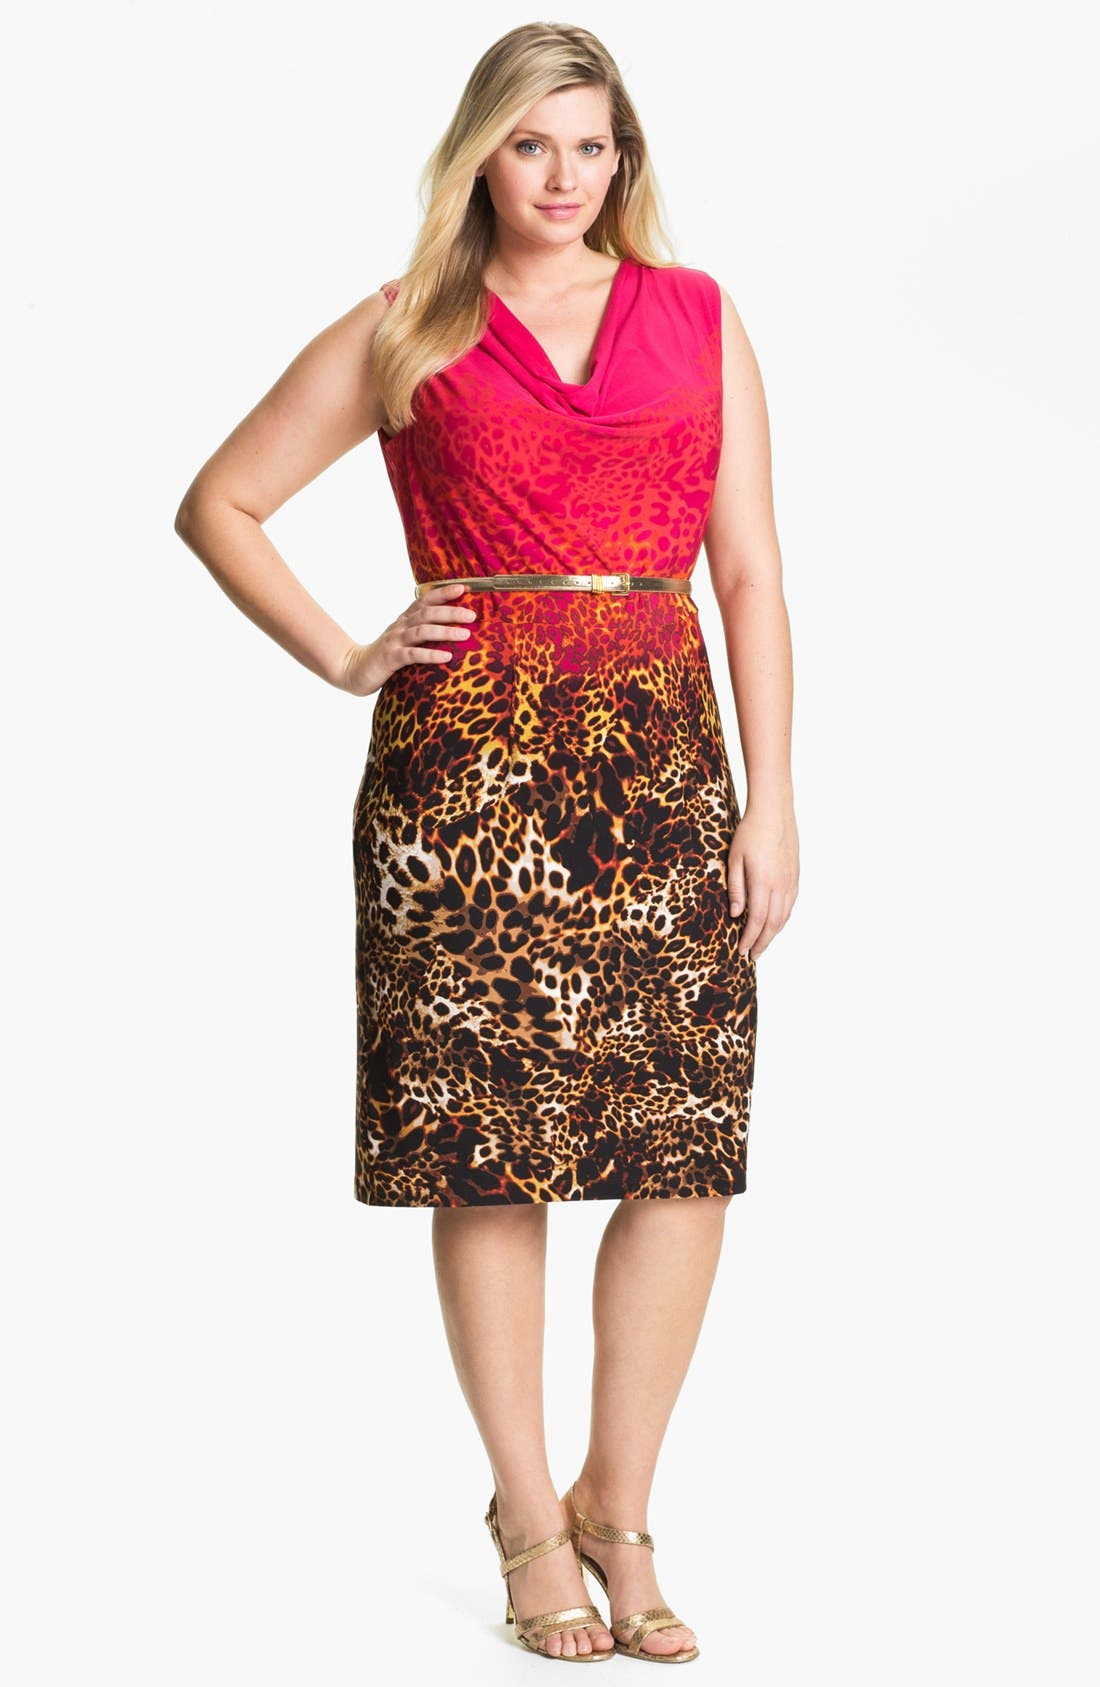 Alternate Image 1 Selected - Calvin Klein Cowl Neck Print Sheath Dress (Plus Size)